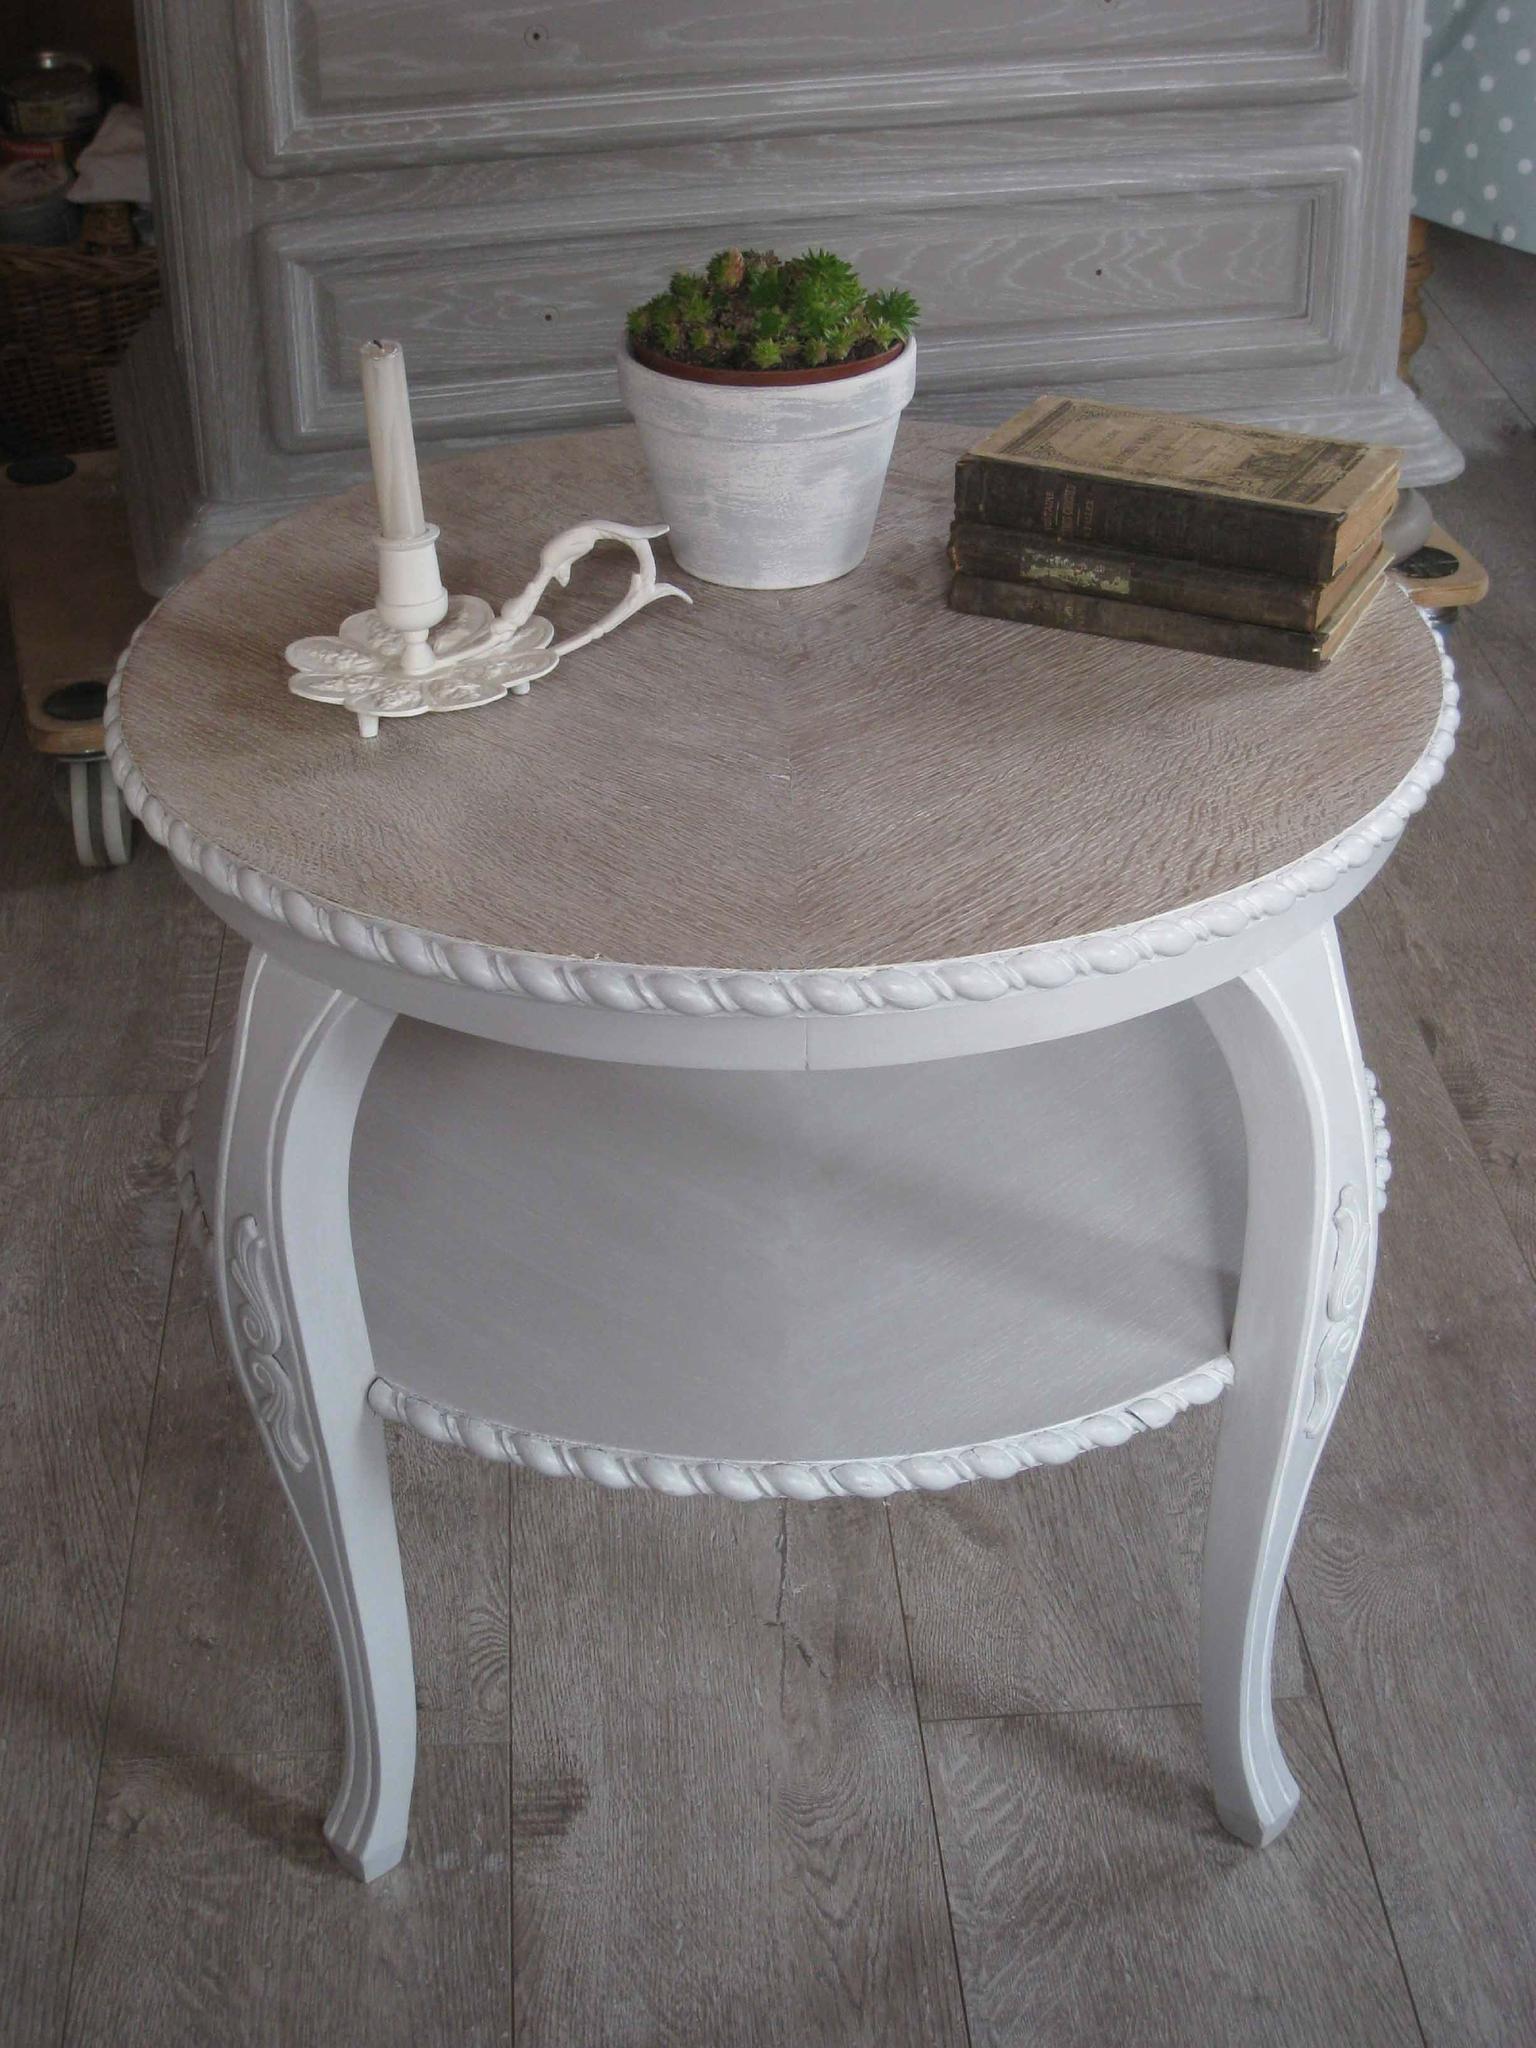 Table basse ikea bon coin - Atwebster.fr - Maison et mobilier